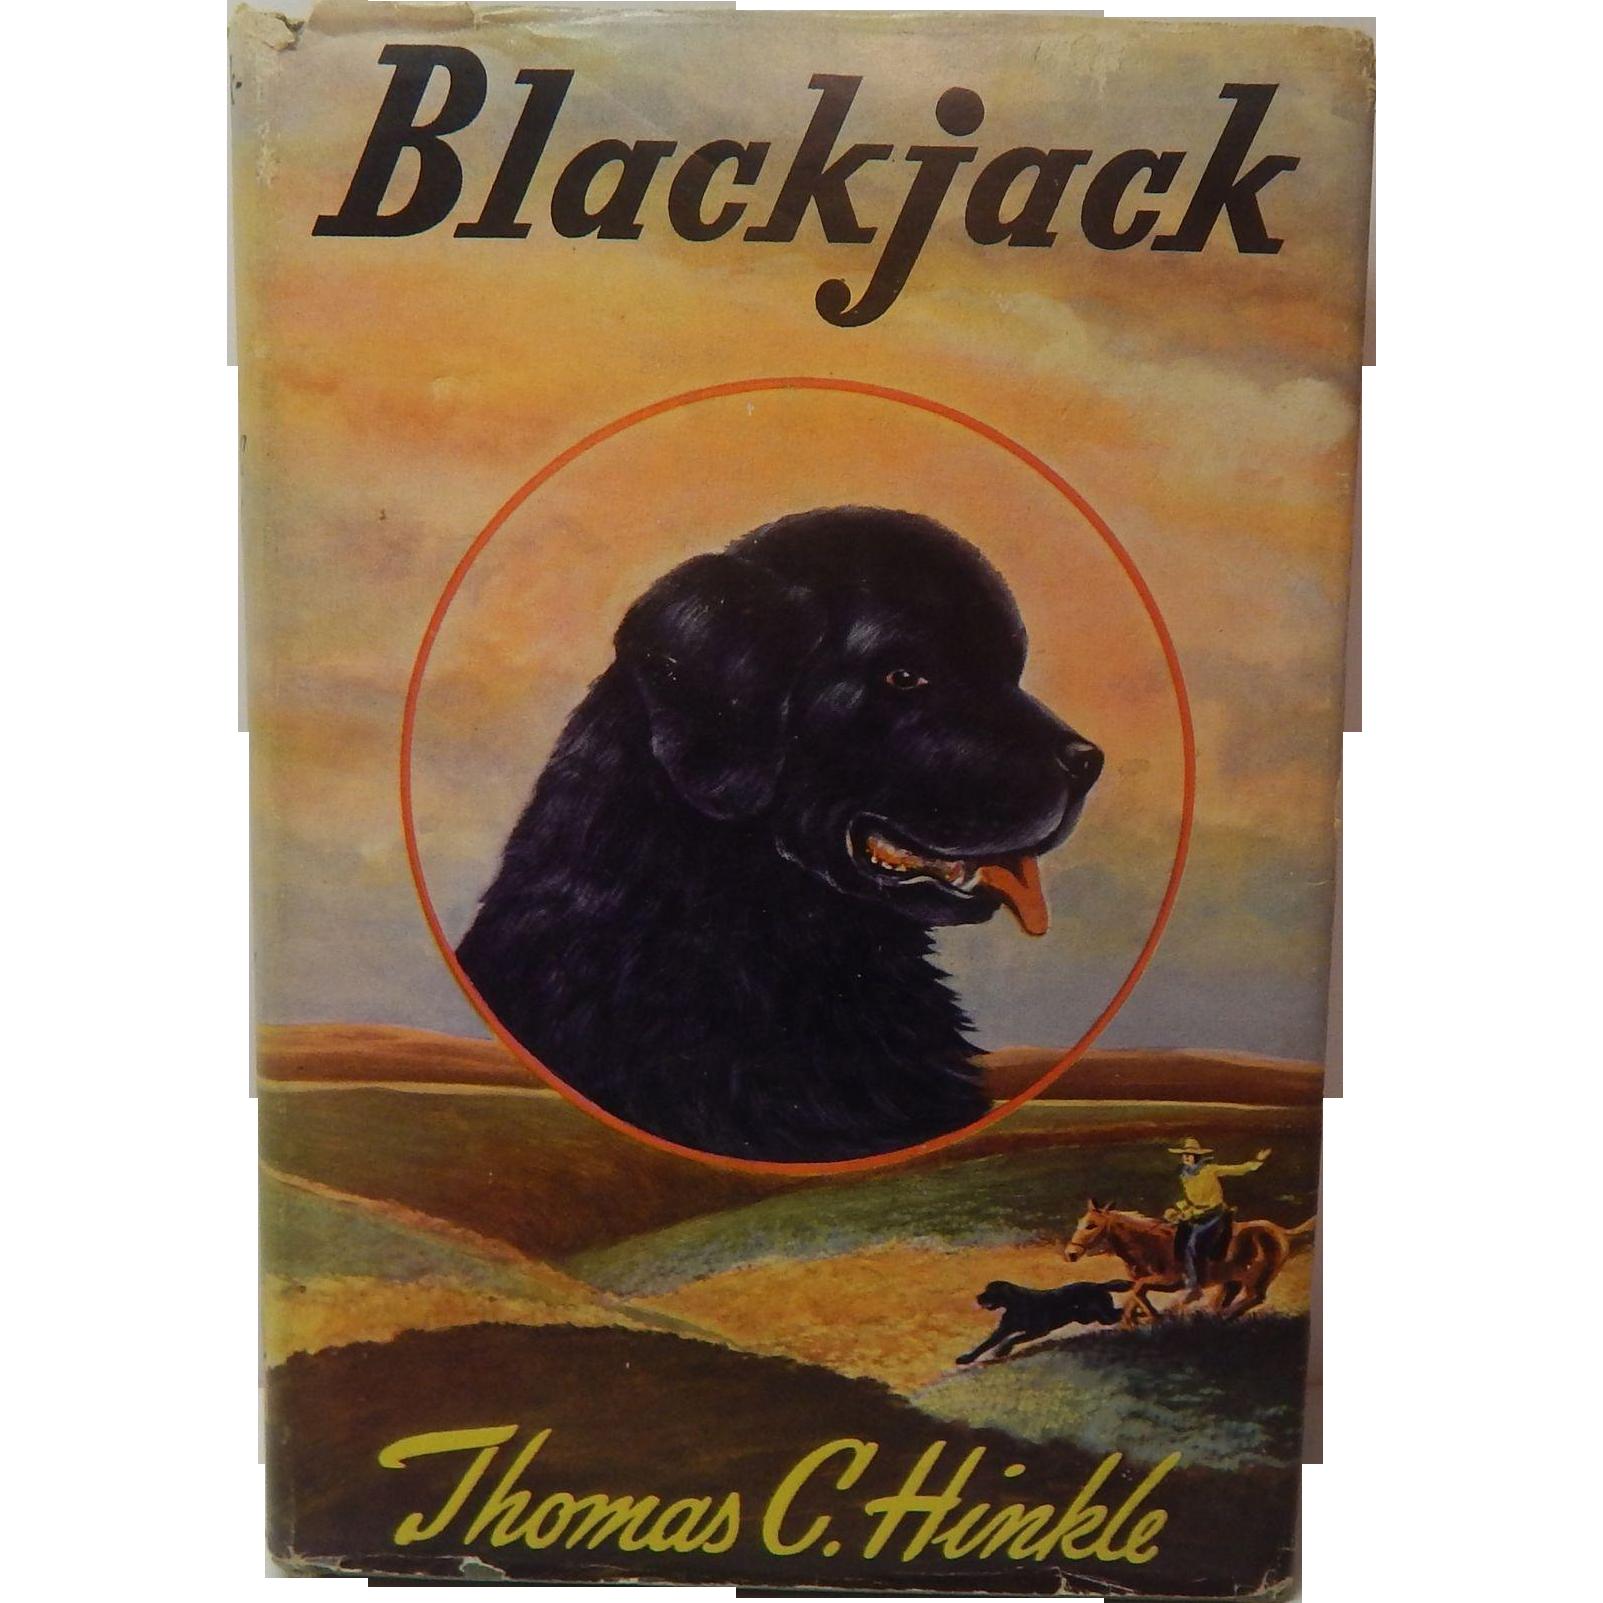 Blackjack A Ranch Dog Thomas C. Hinkle